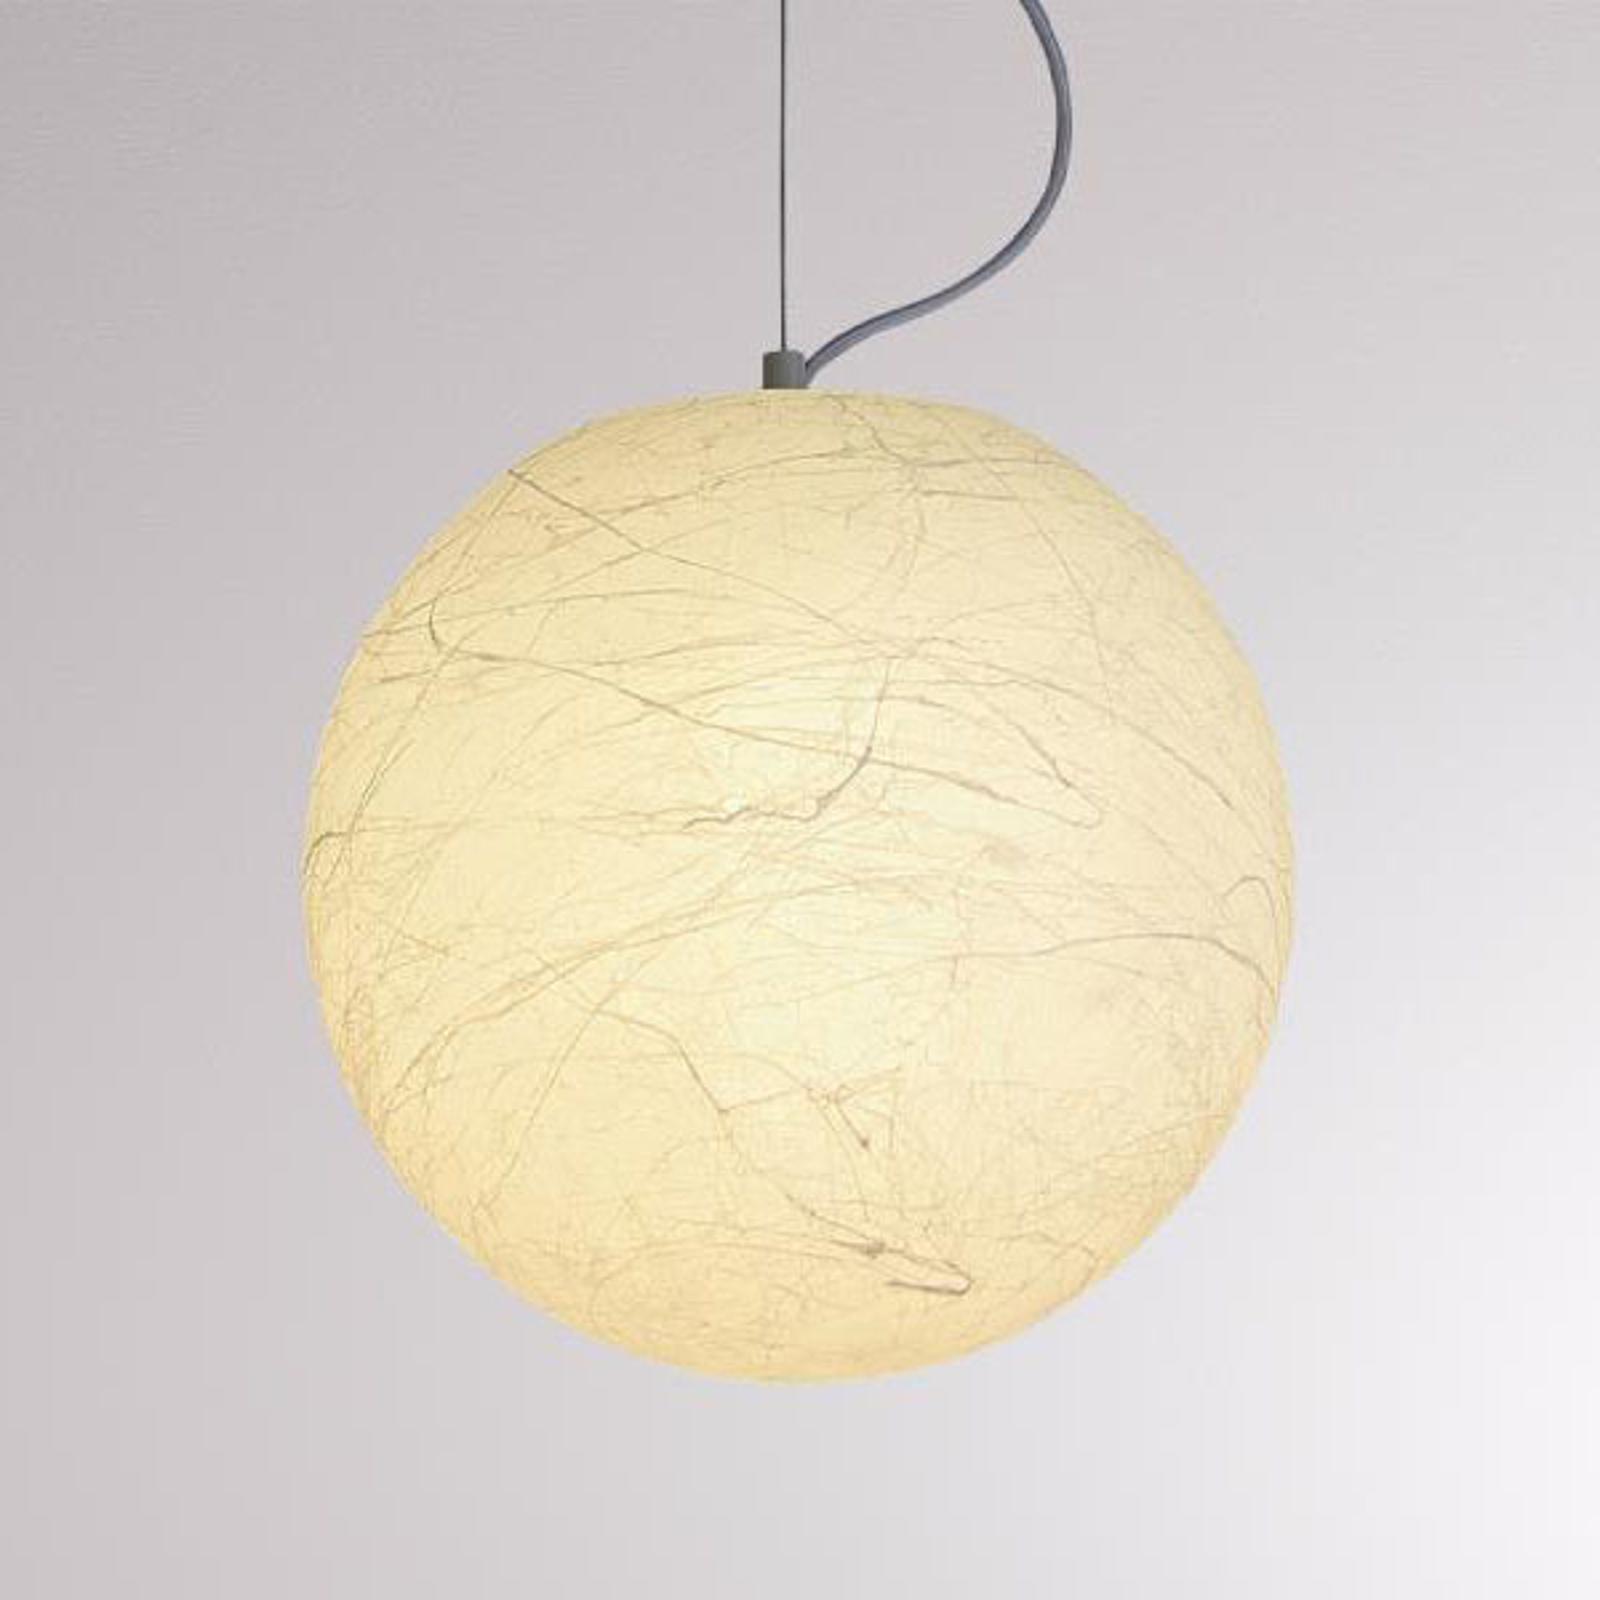 LOUM Diovis hanglamp Ø 40 cm